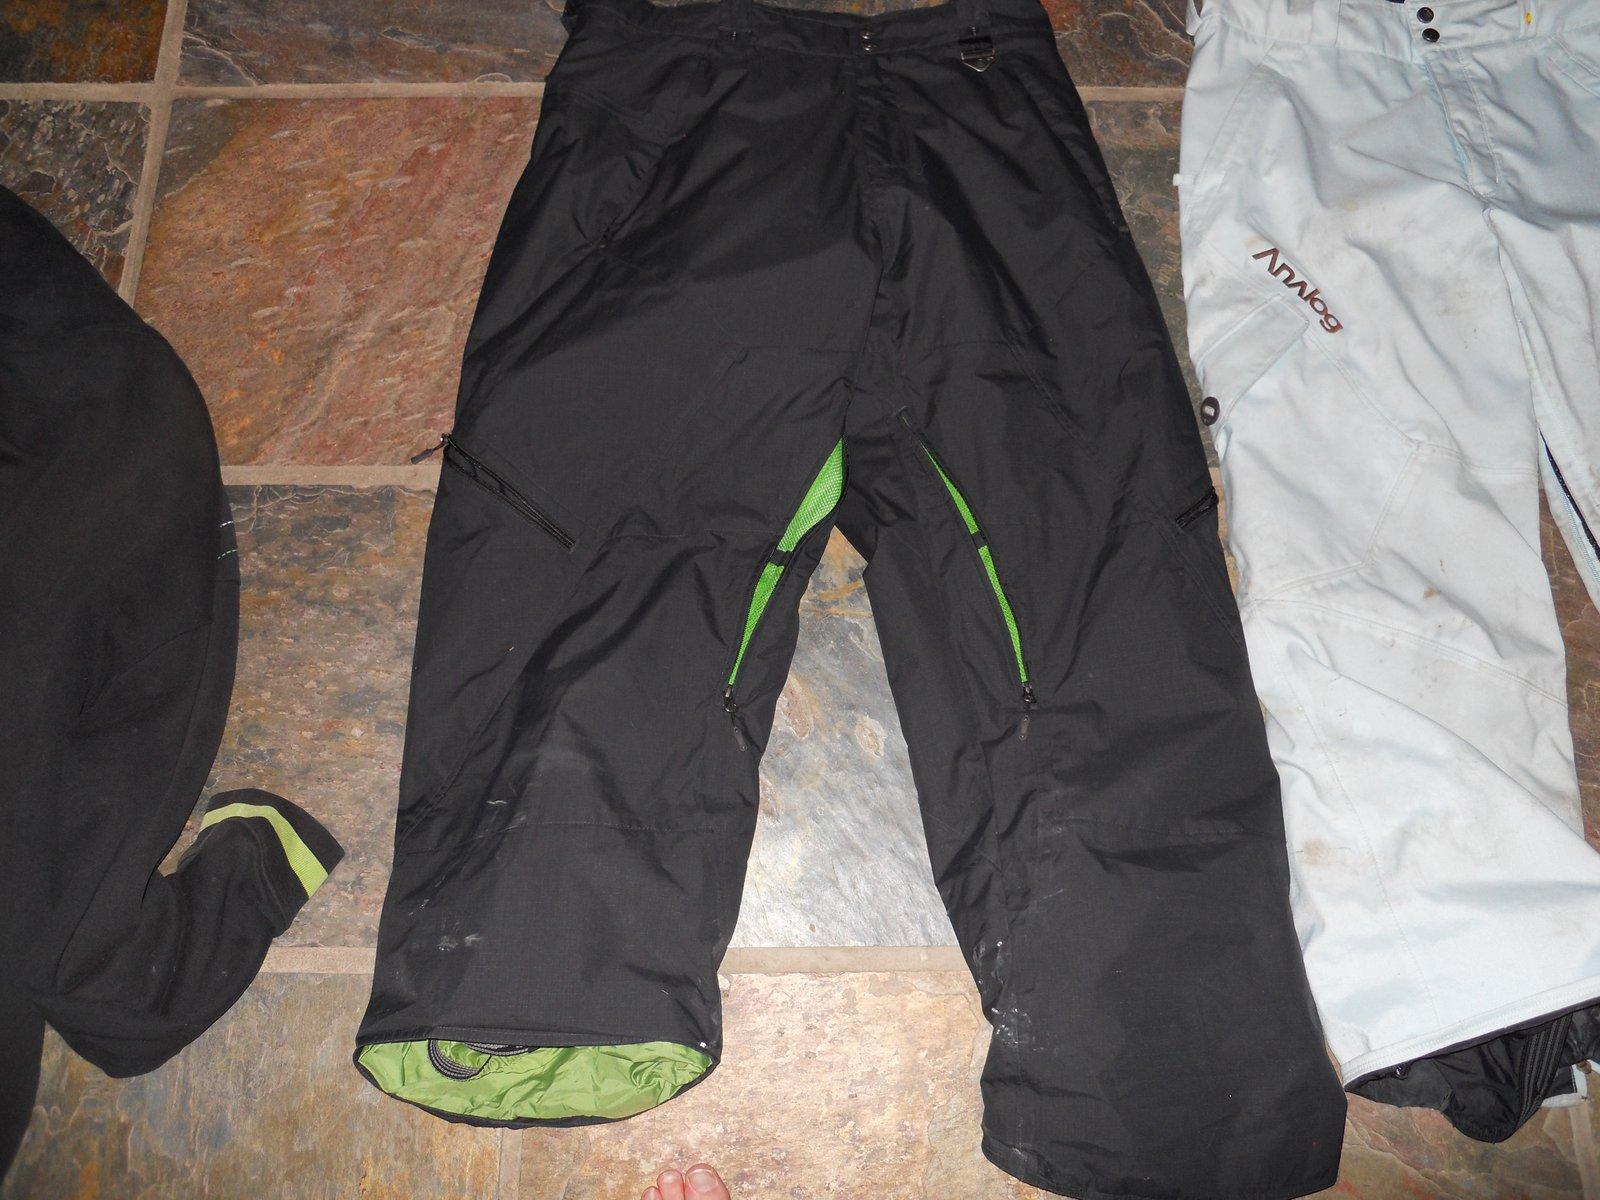 Black oakley pants for sale